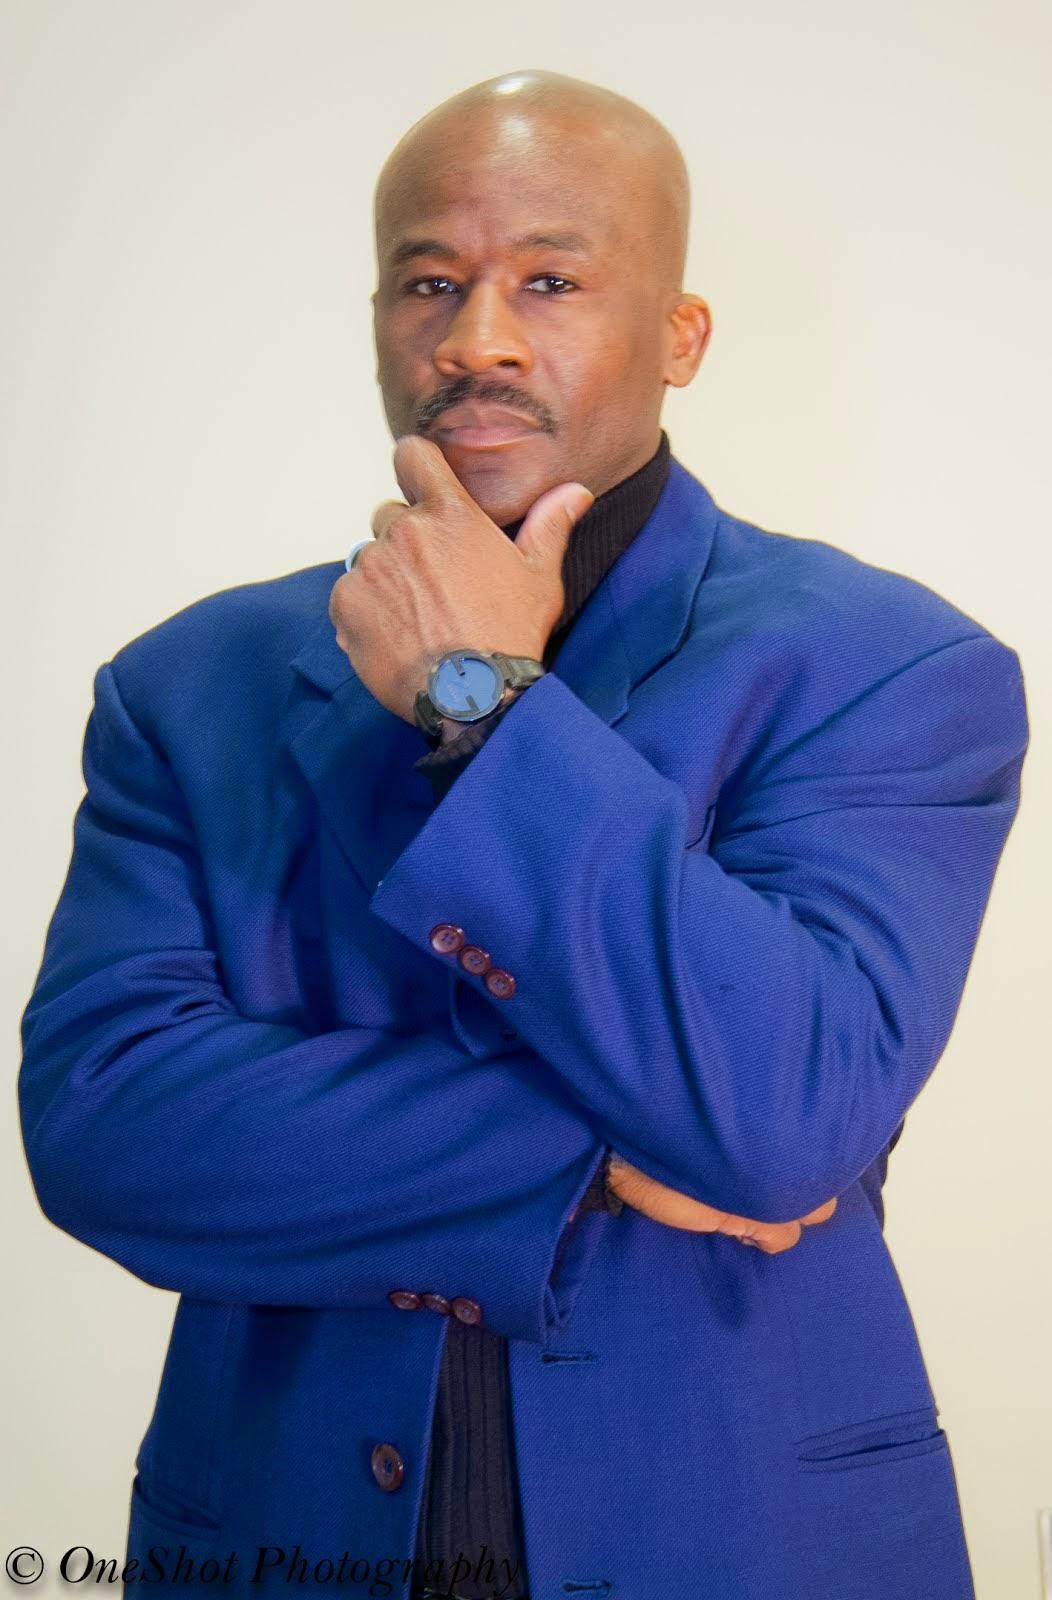 Art Powell - Anti-Violence Specialist/Life Skills Coach